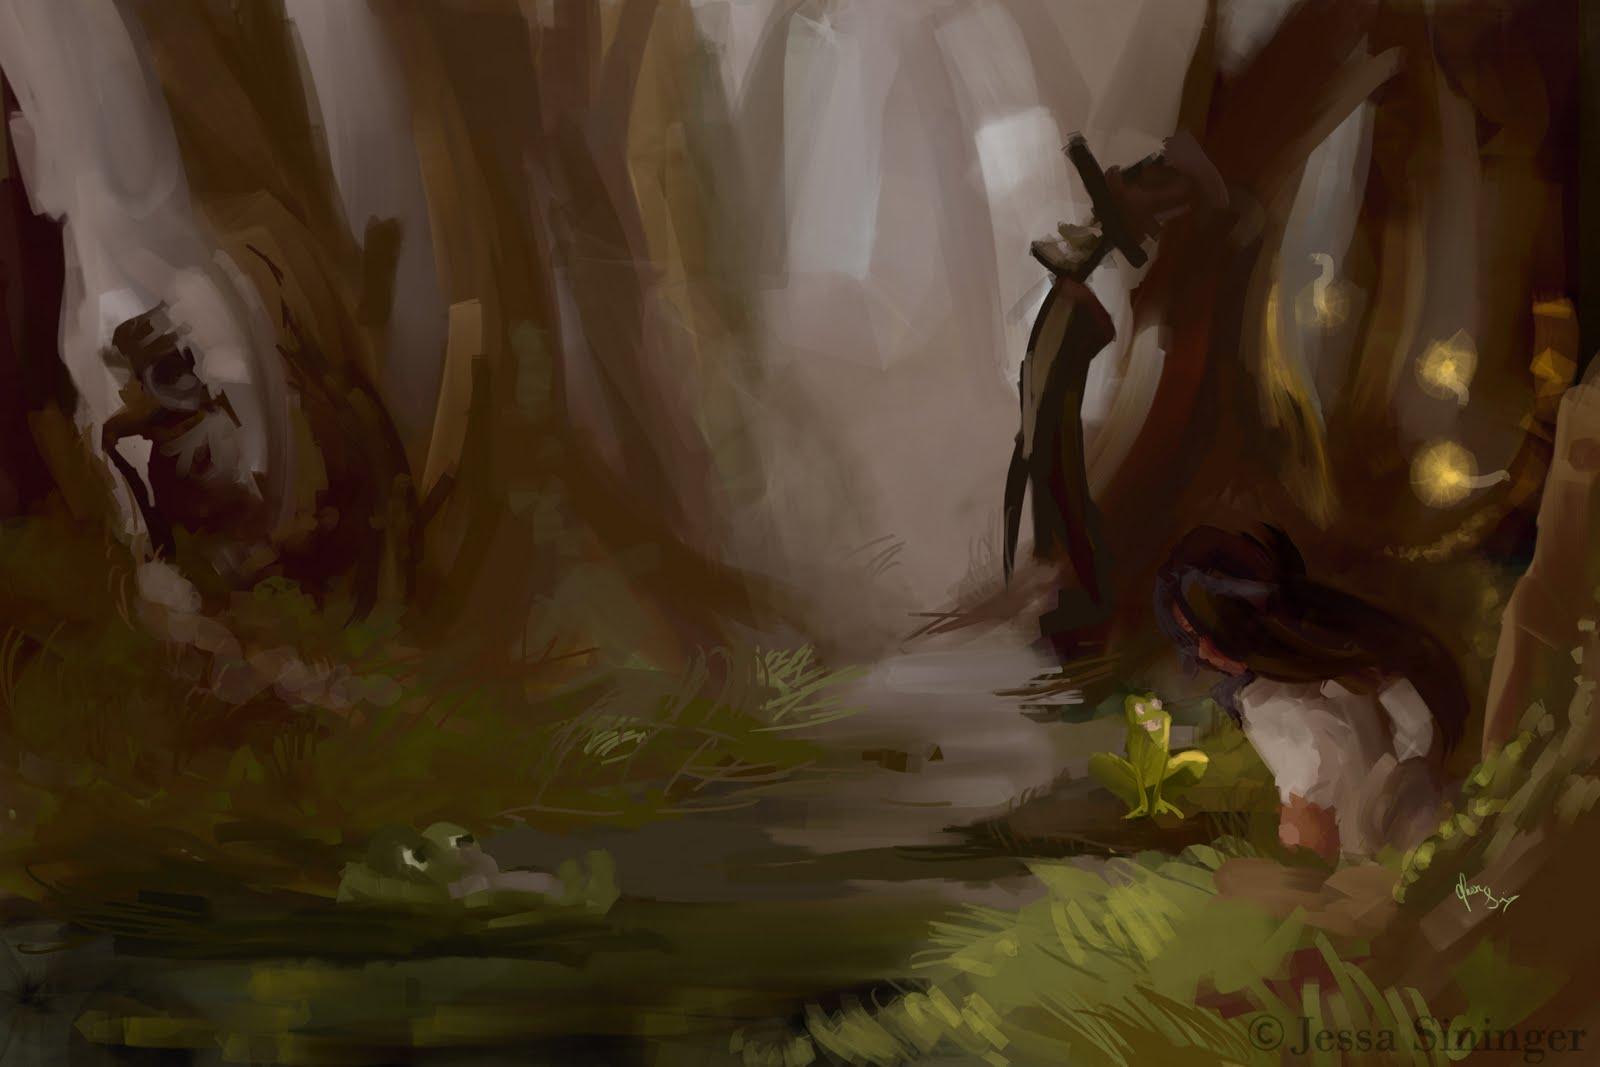 Jessa Sininger\'s Art Blog: The Princess and the Frog Art